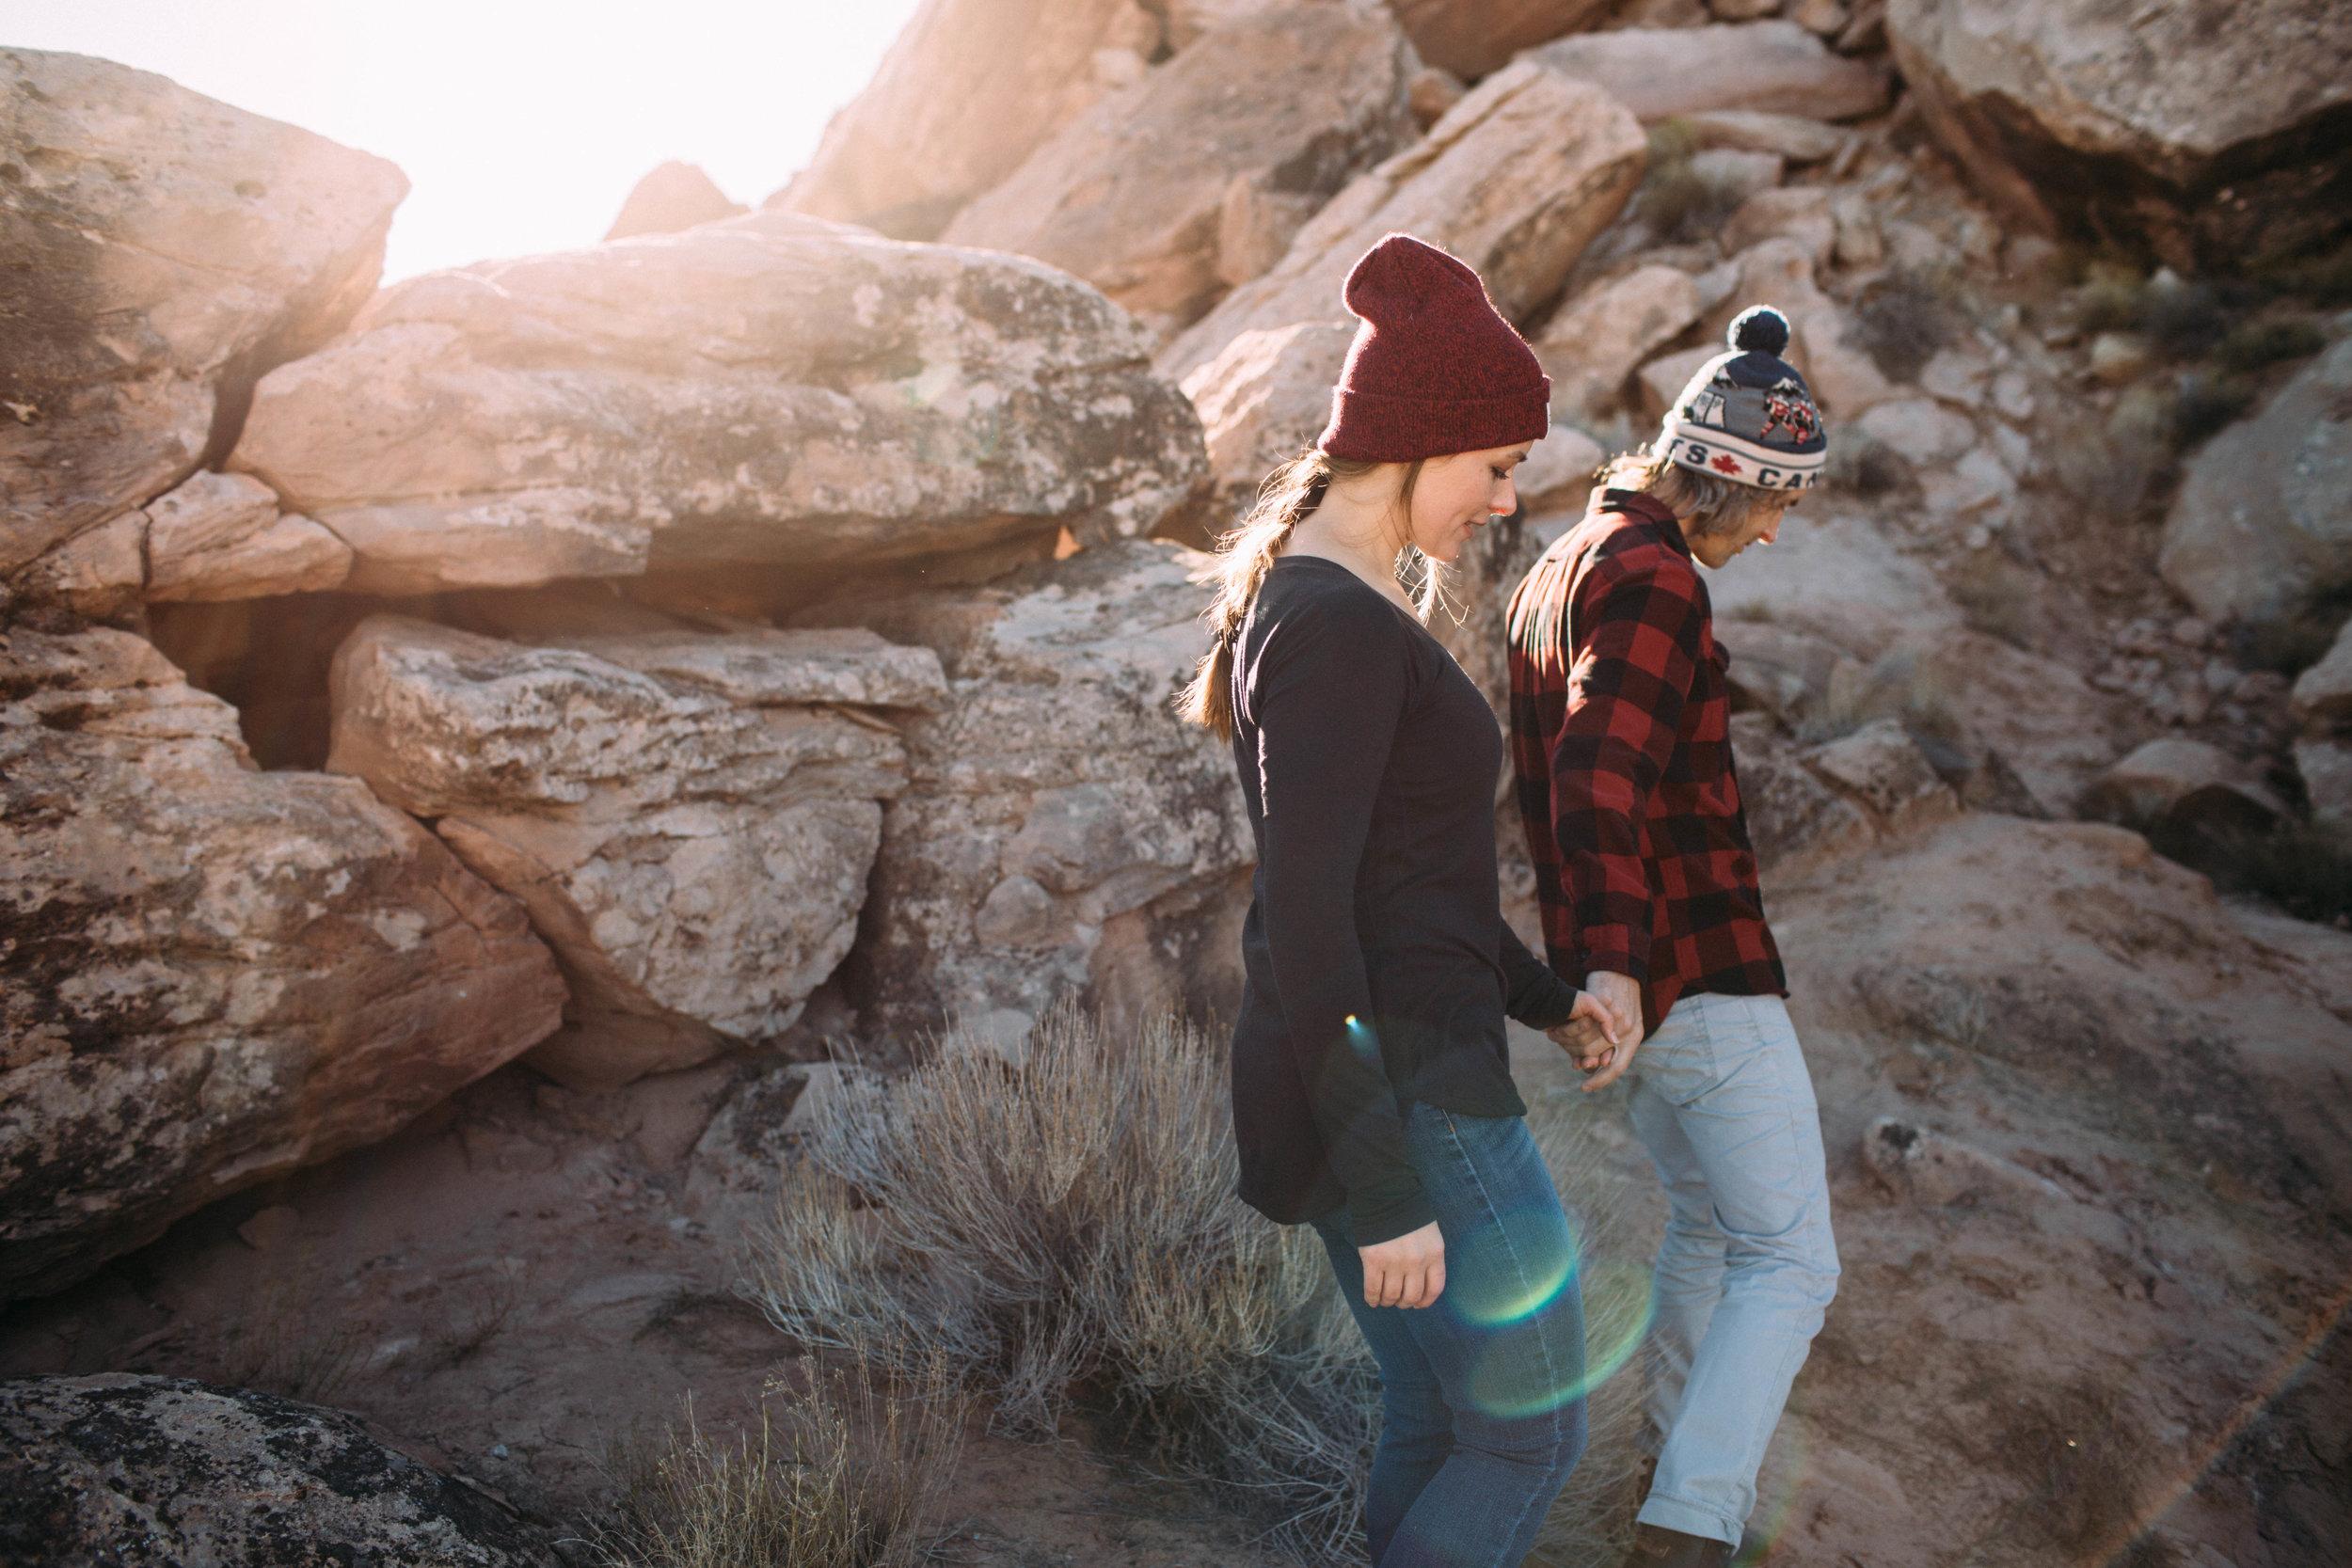 Beautiful-Outdoorsy-Engaged-Couple.jpg